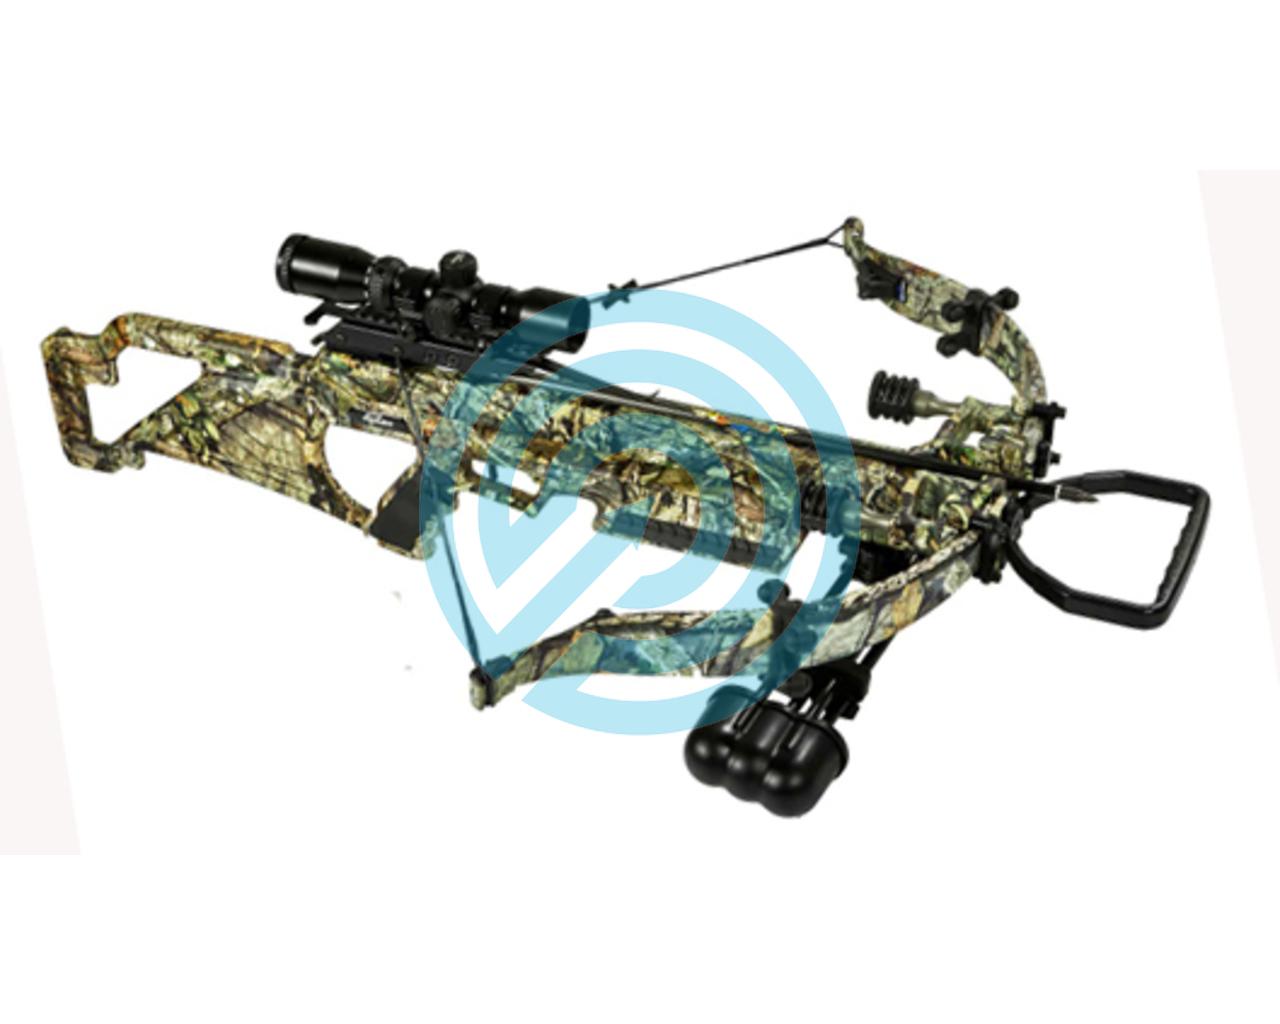 Excalibur Crossbow Matrix Bulldog 330 Package | 114744-1000